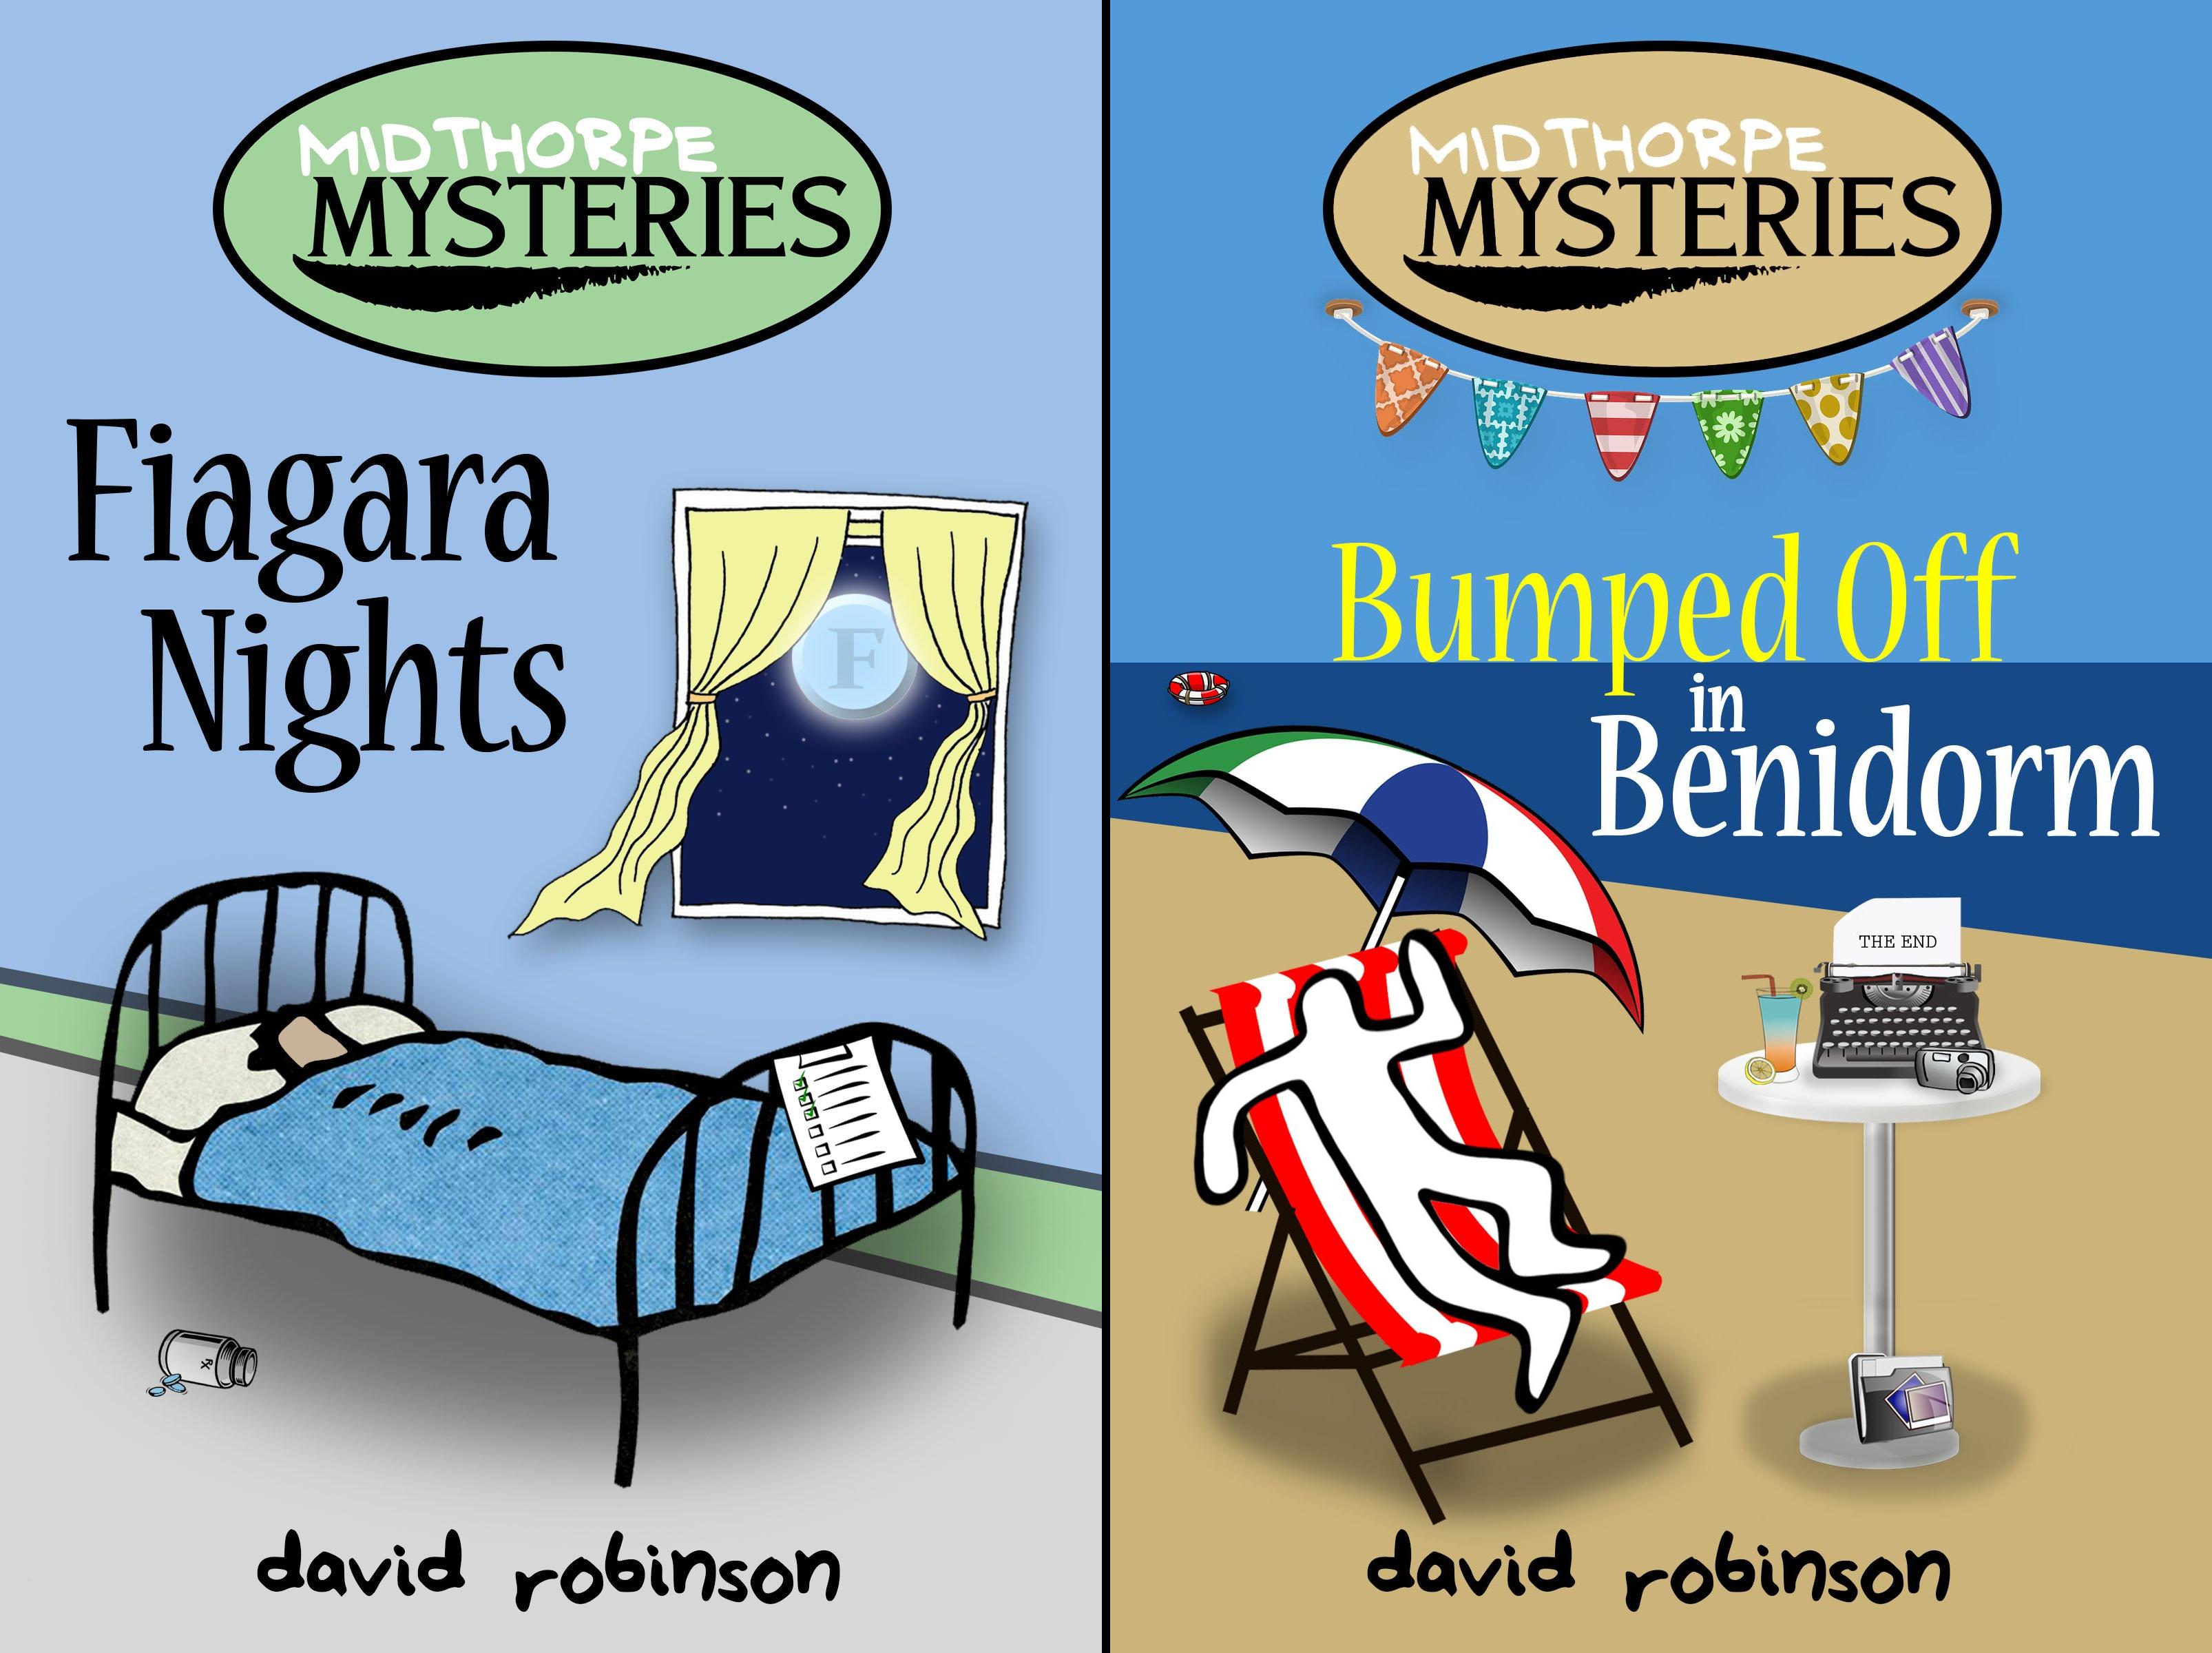 The Midthorpe Mysteries (2 Book Series)